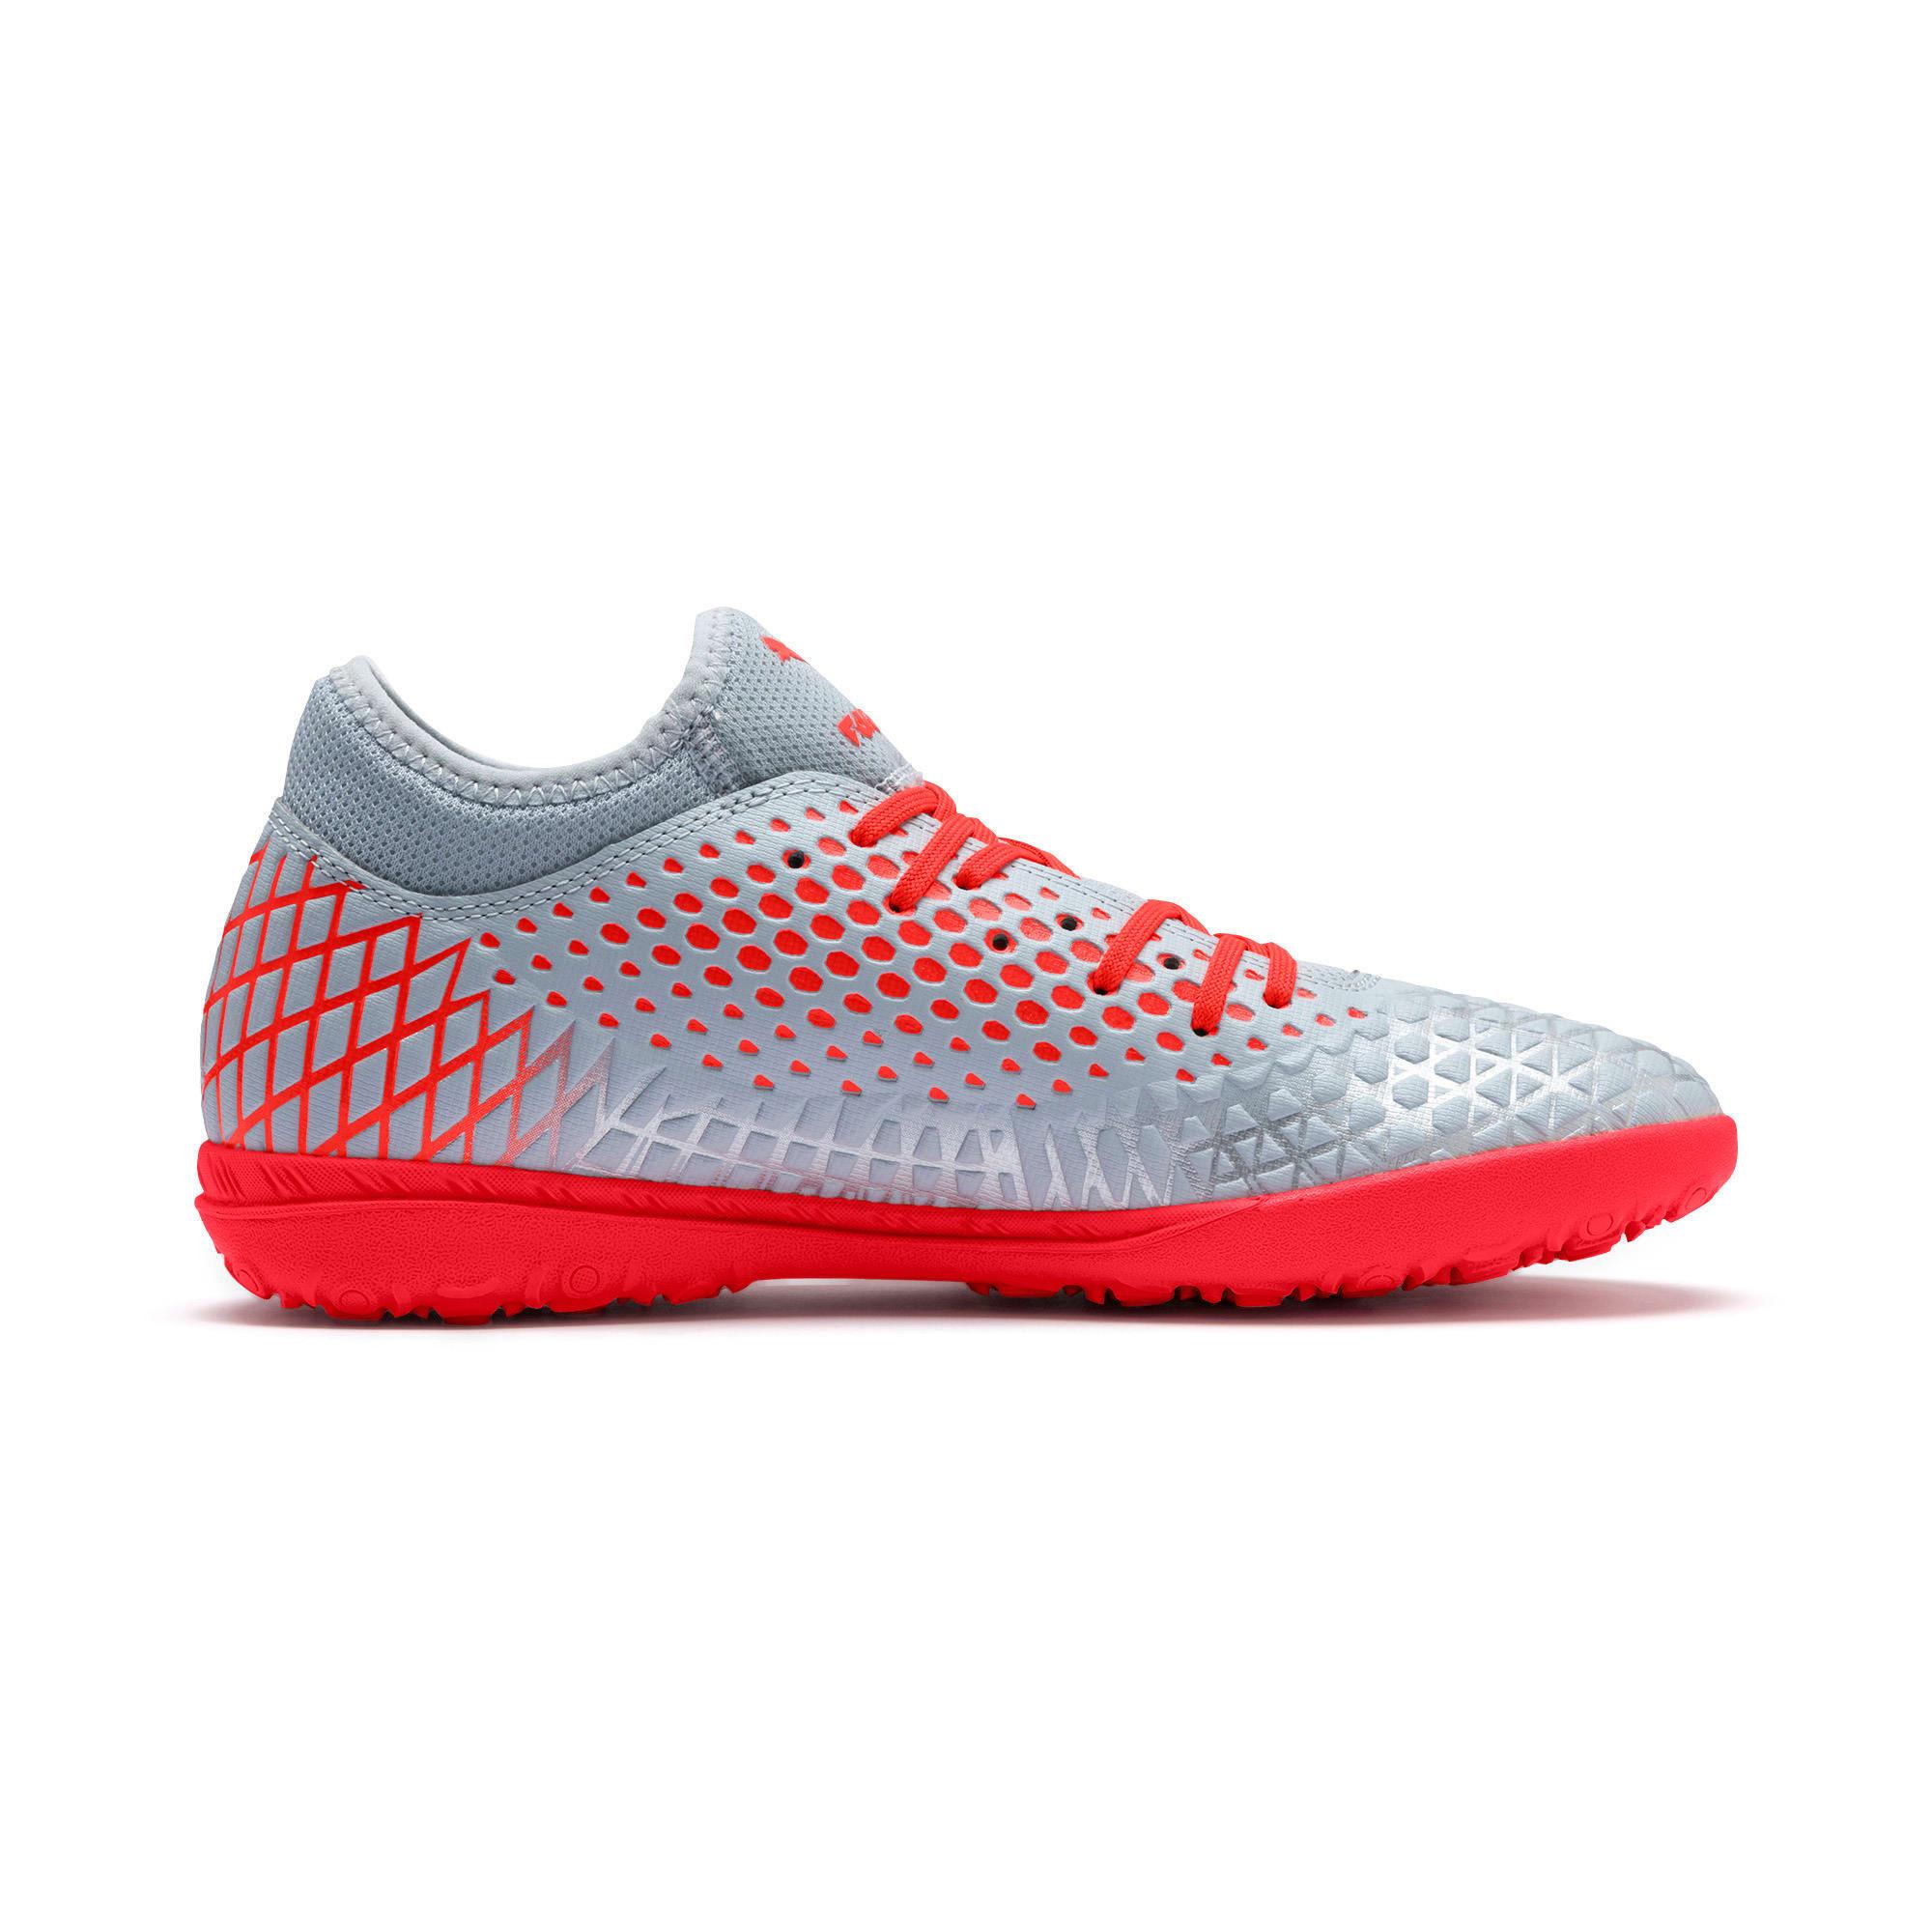 Thumbnail 6 of FUTURE 4.4 TT Men's Soccer Shoes, Glacial Blue-Nrgy Red, medium